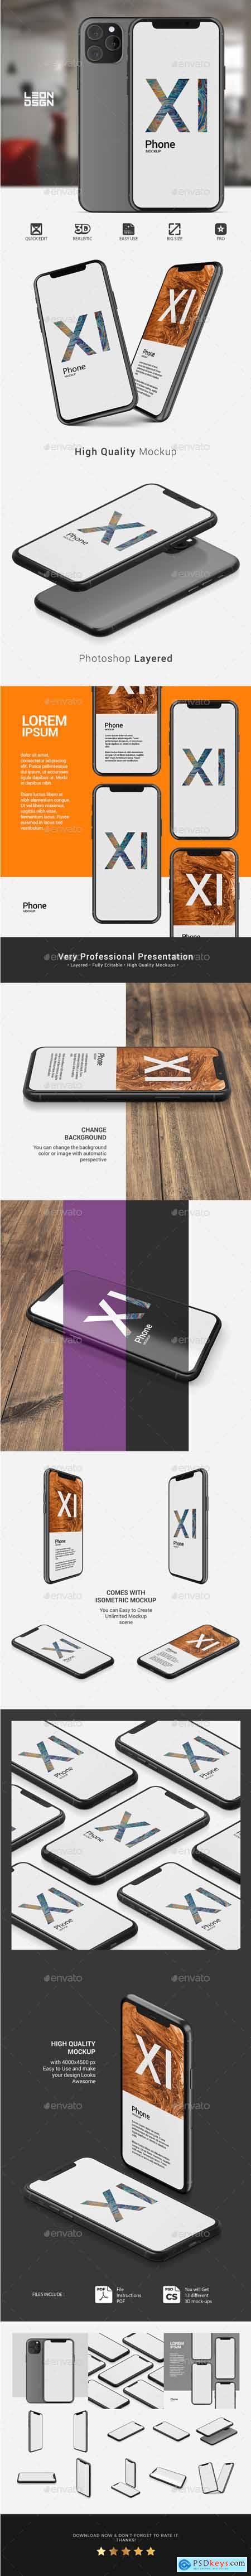 Phone 11 - App Presentation Mockup 25574211